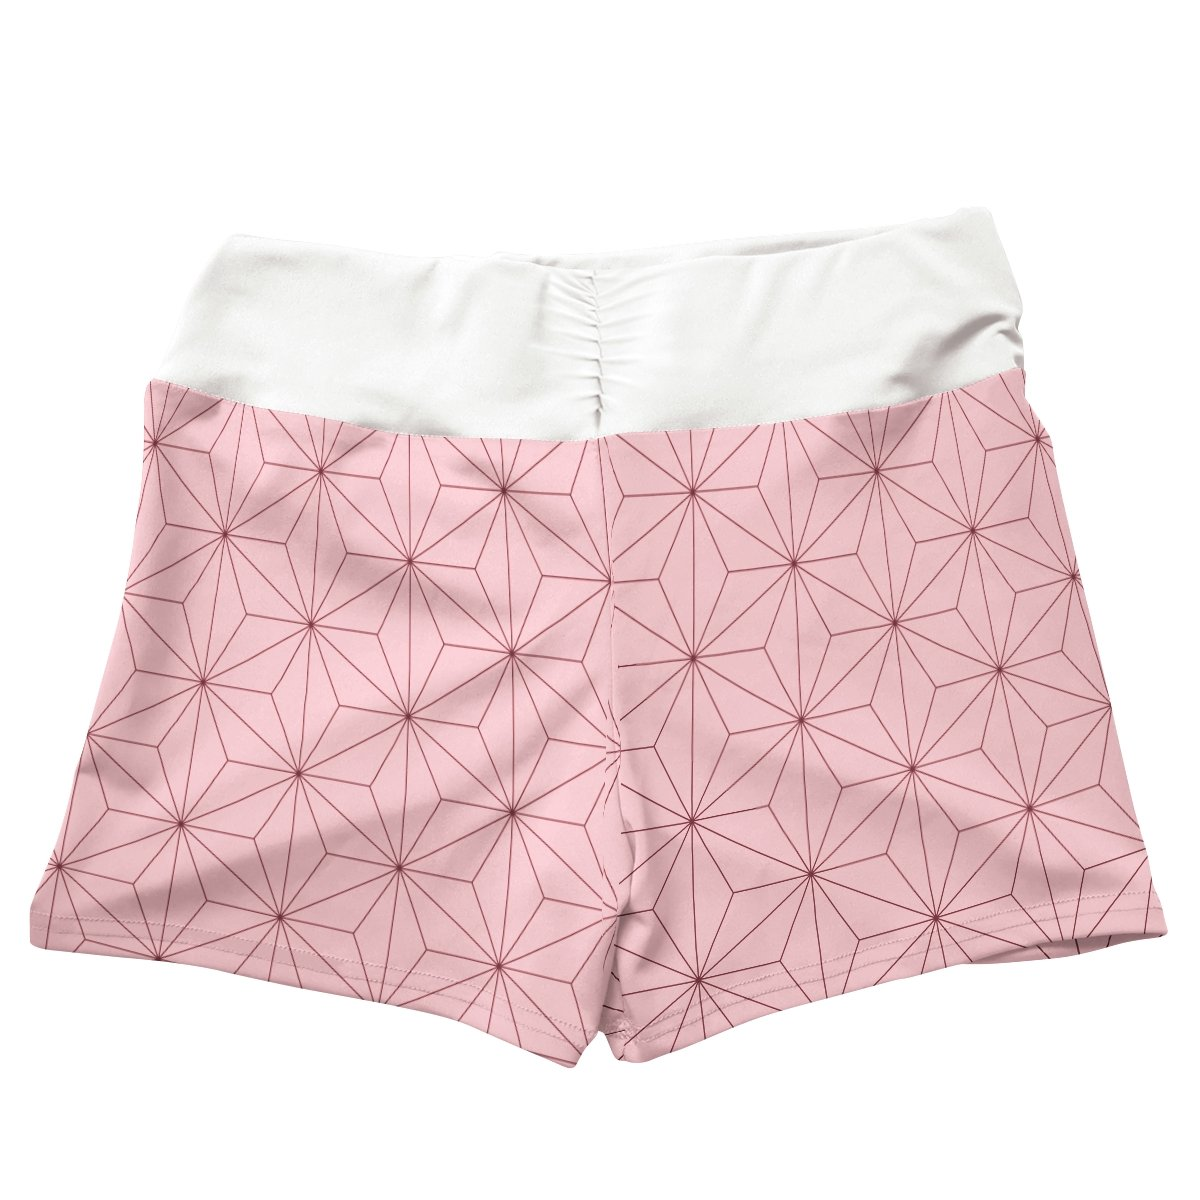 summer nezuko active wear set 434571 - Anime Swimsuits